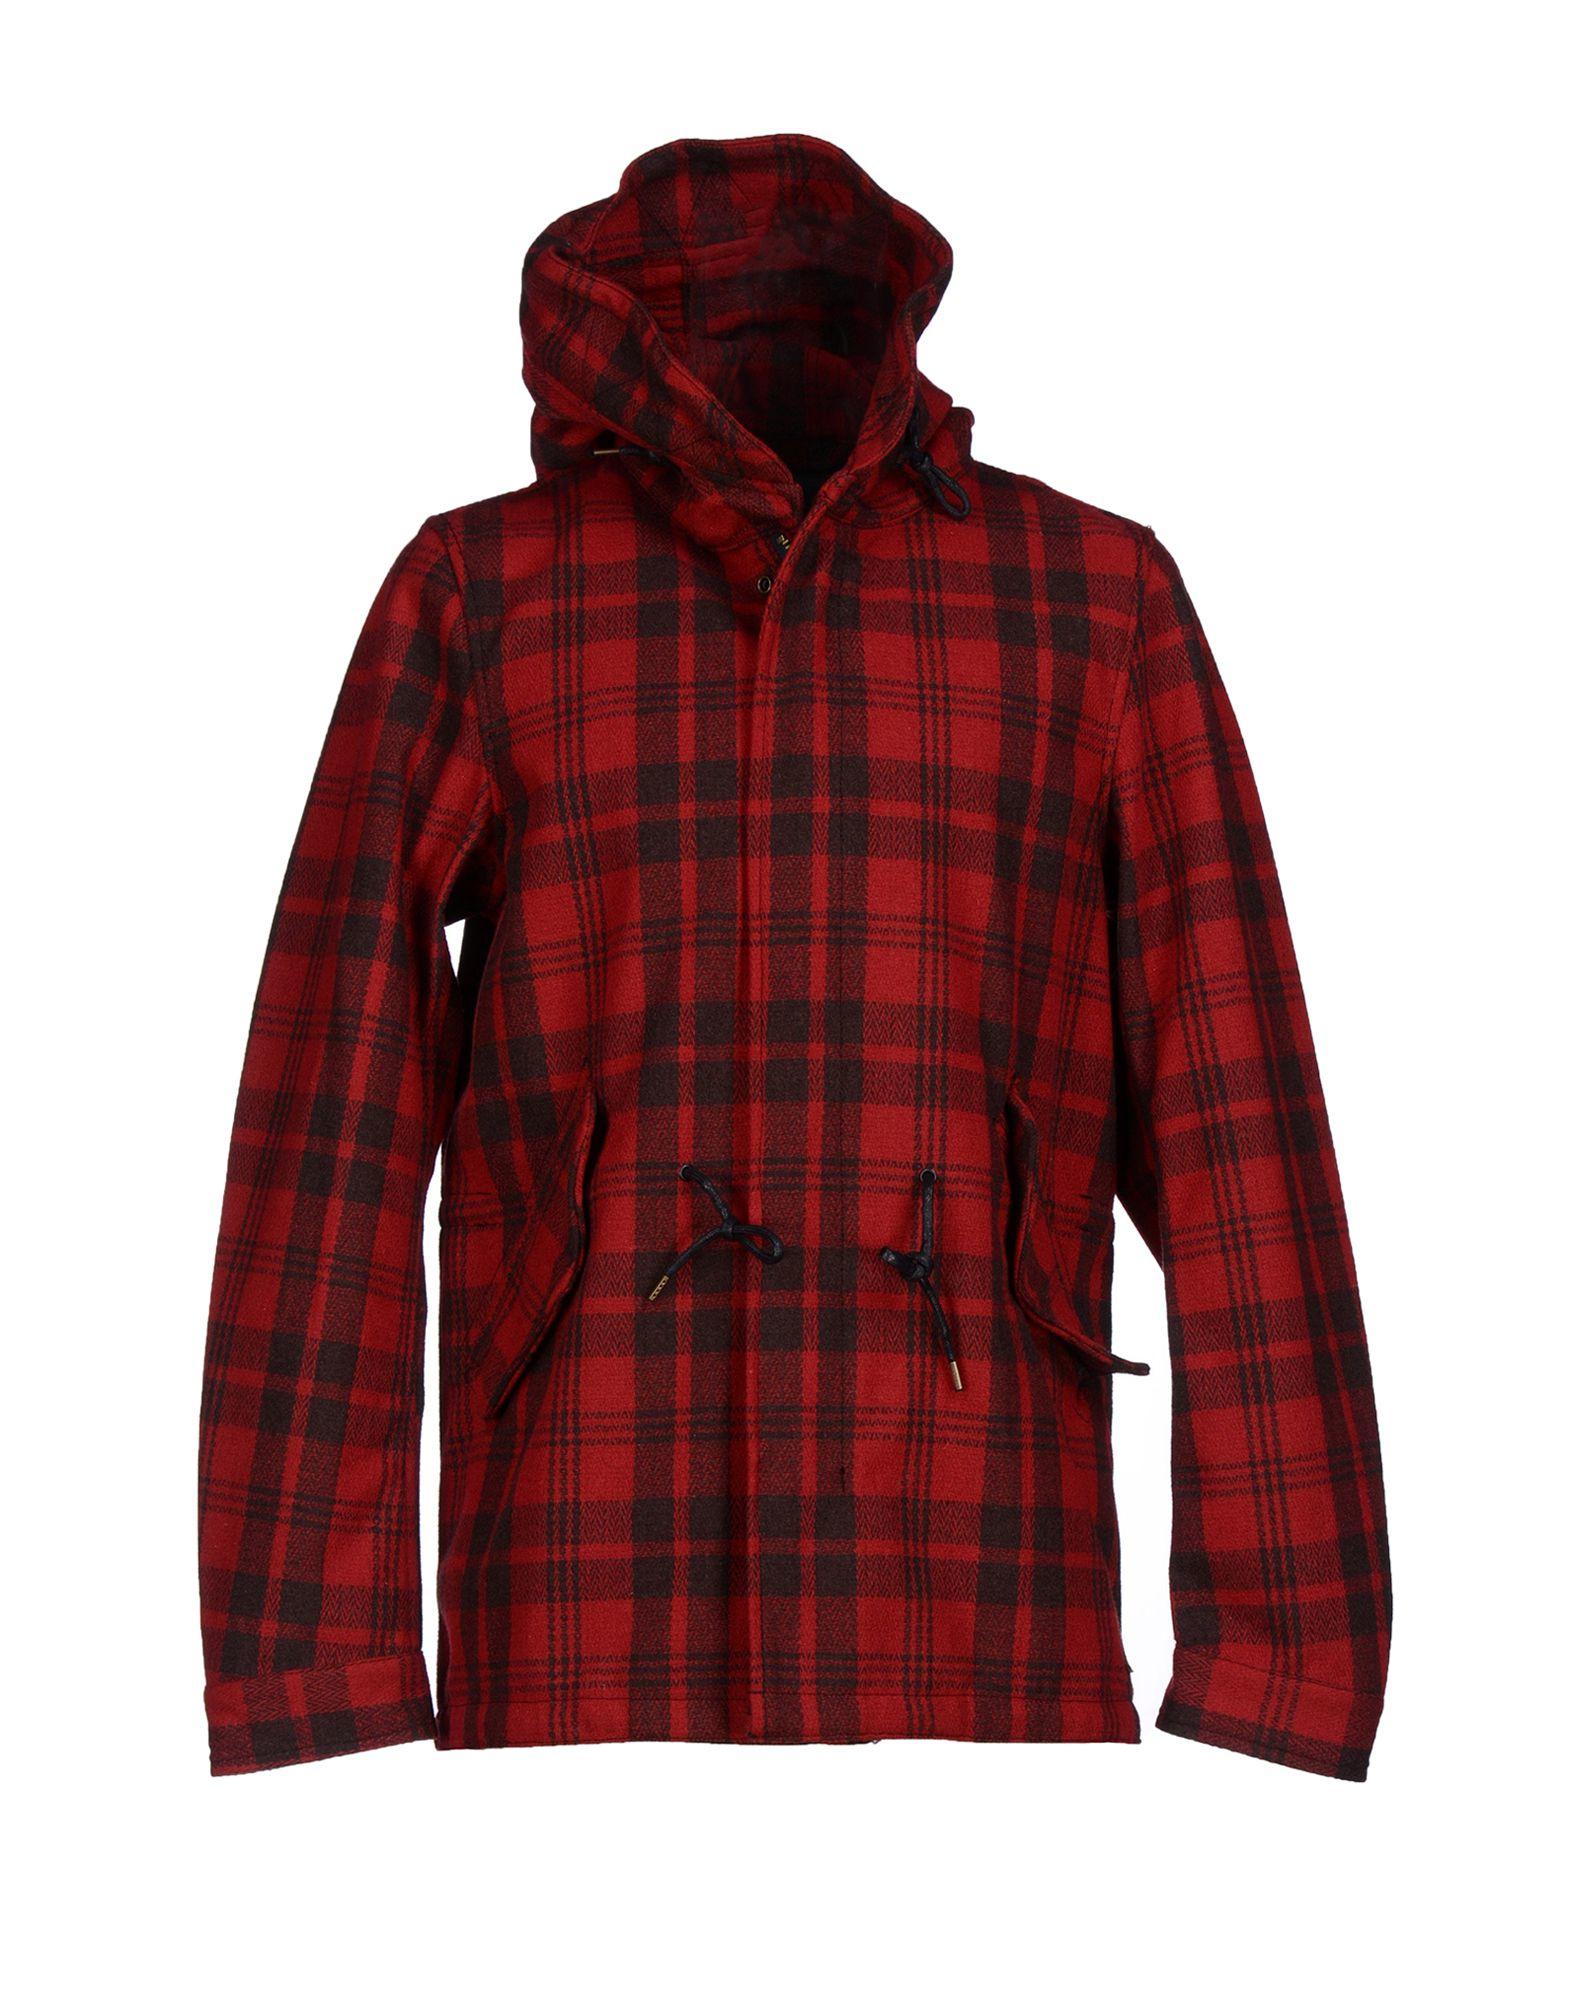 lyst scotch soda jacket in red for men. Black Bedroom Furniture Sets. Home Design Ideas